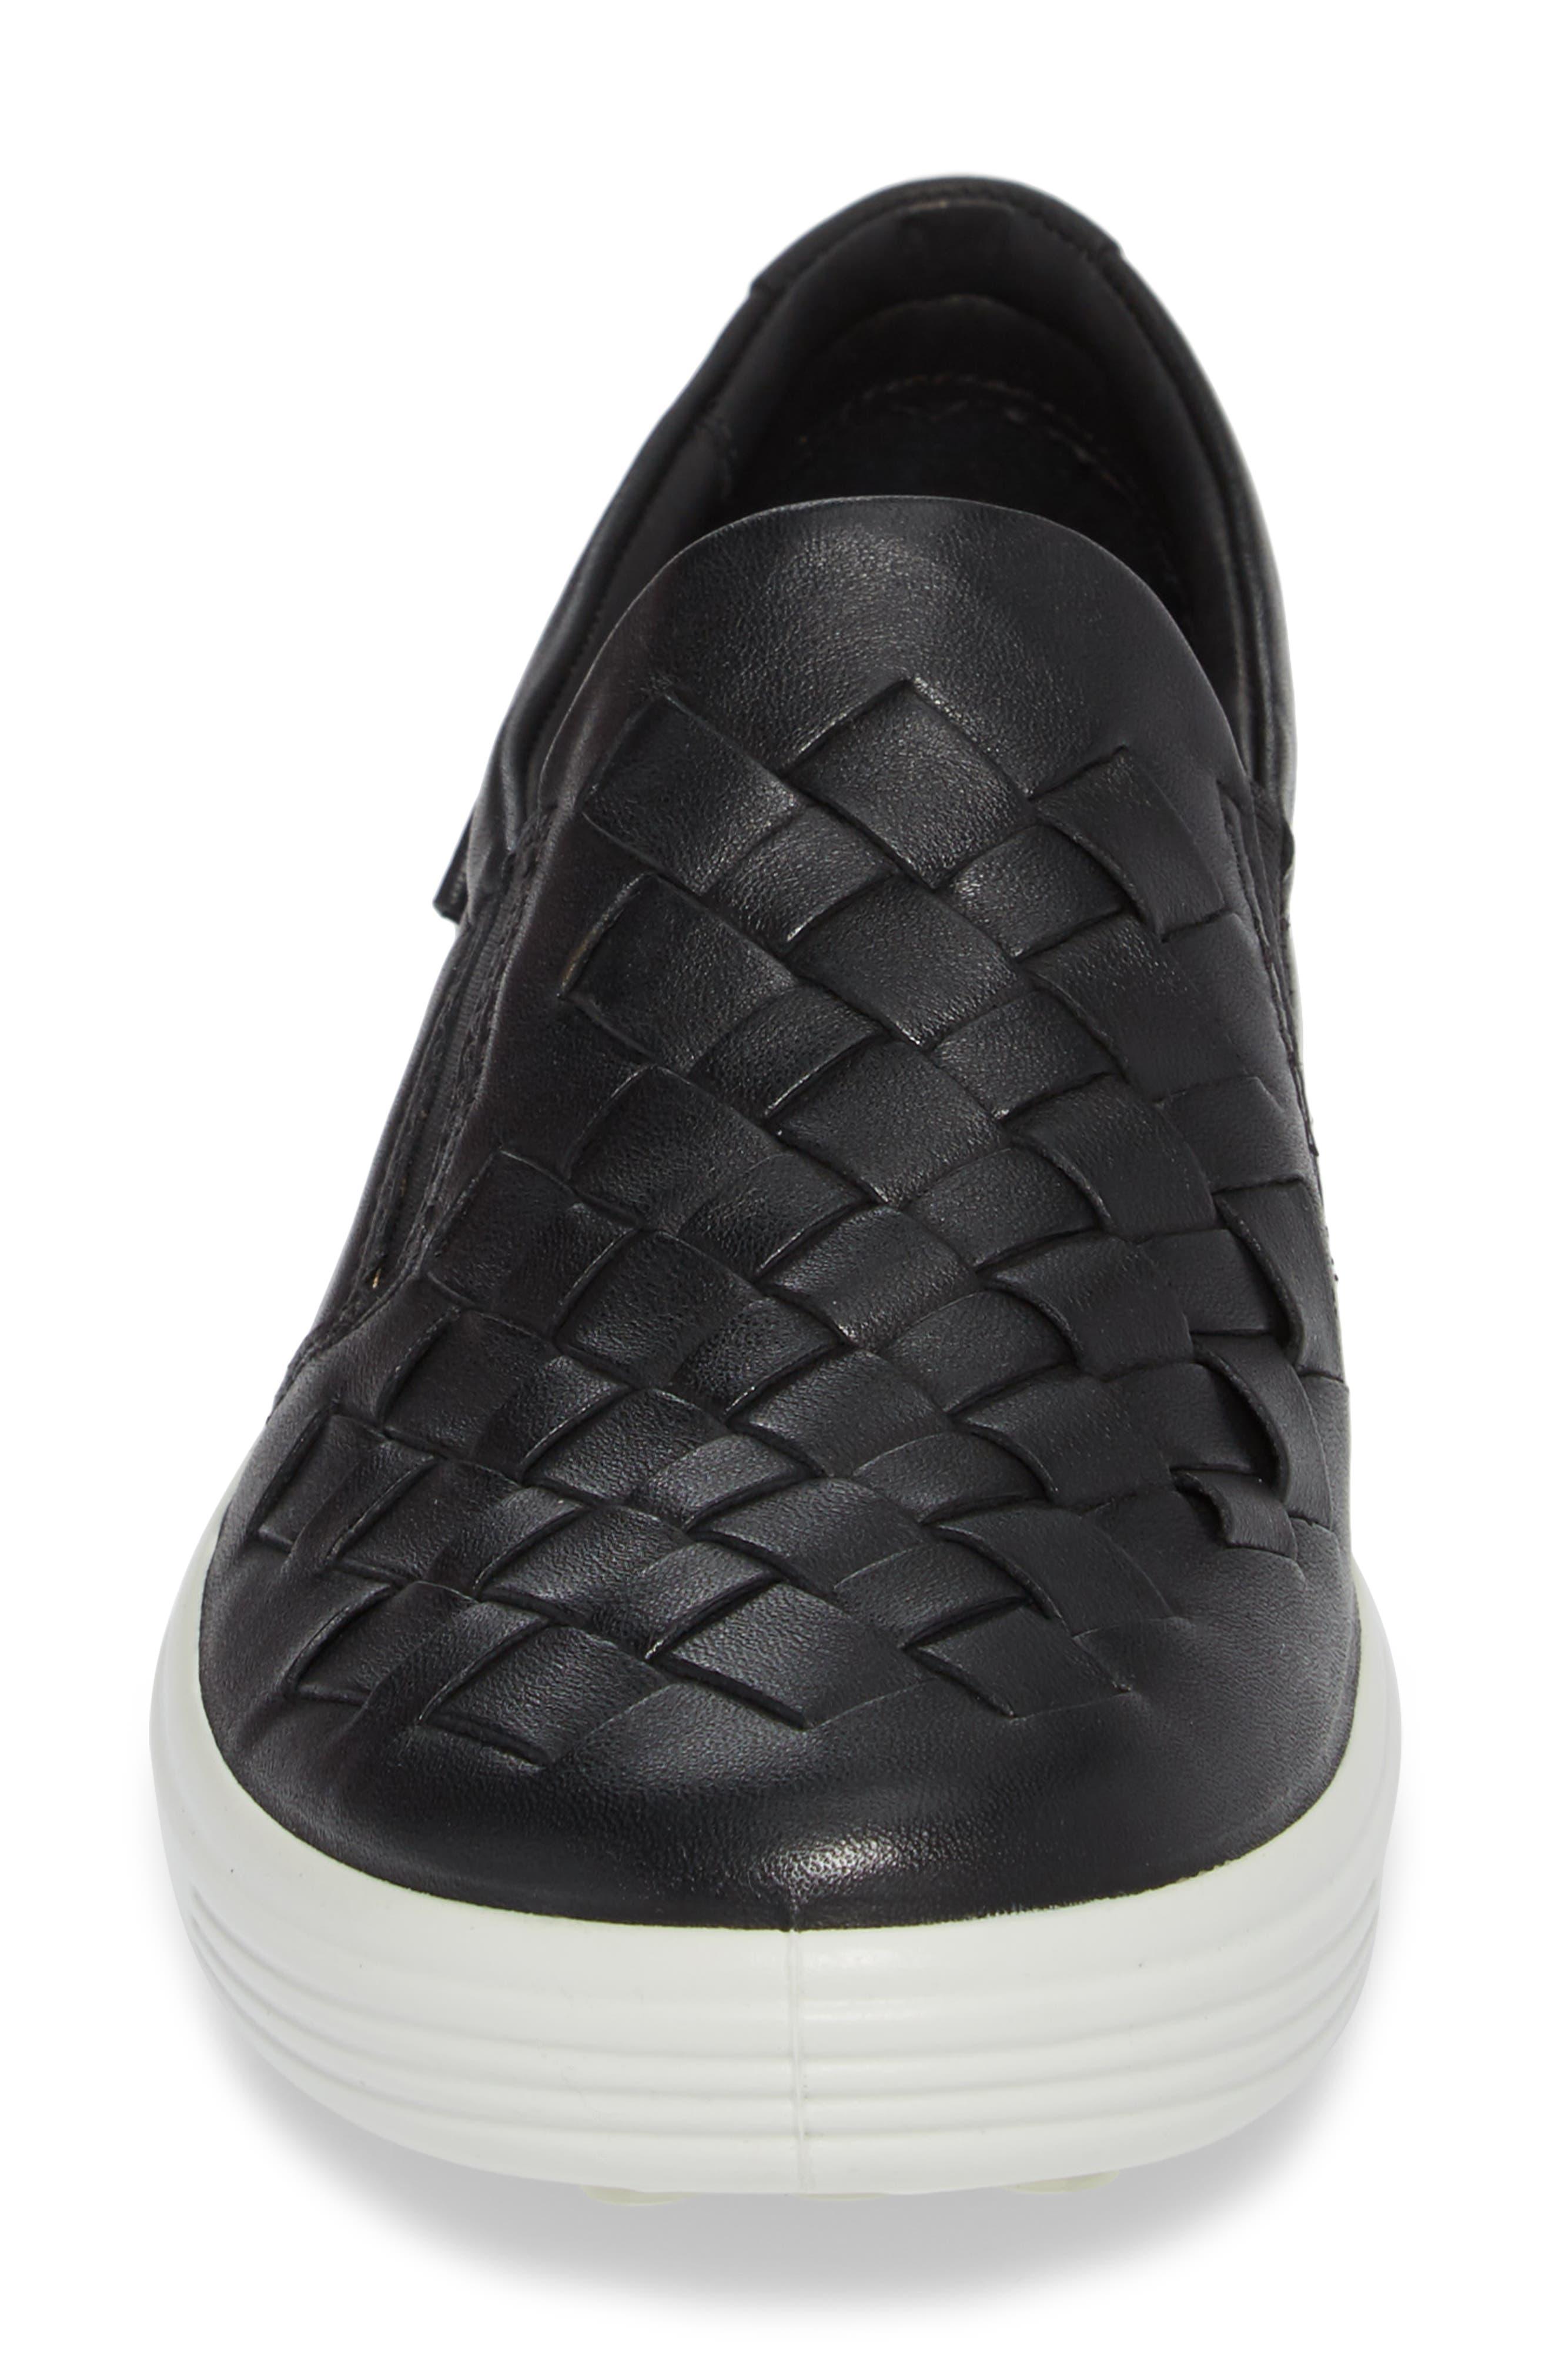 ECO Soft 7 Woven Slip-On Sneaker,                             Alternate thumbnail 4, color,                             Black Leather